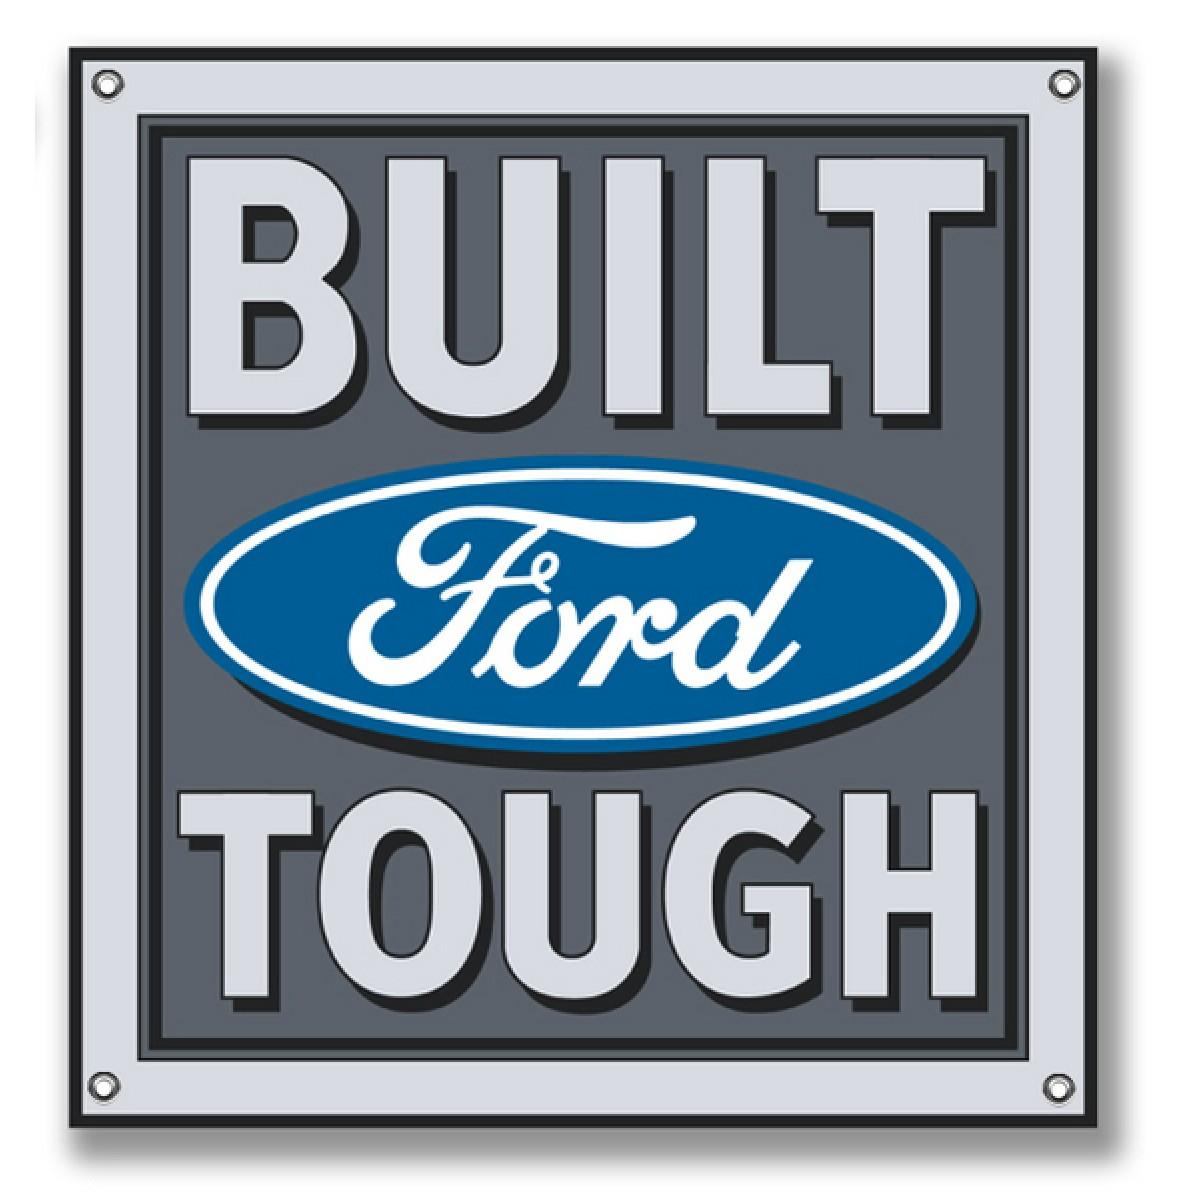 Built Ford Tough Wallpaper 1200x1200